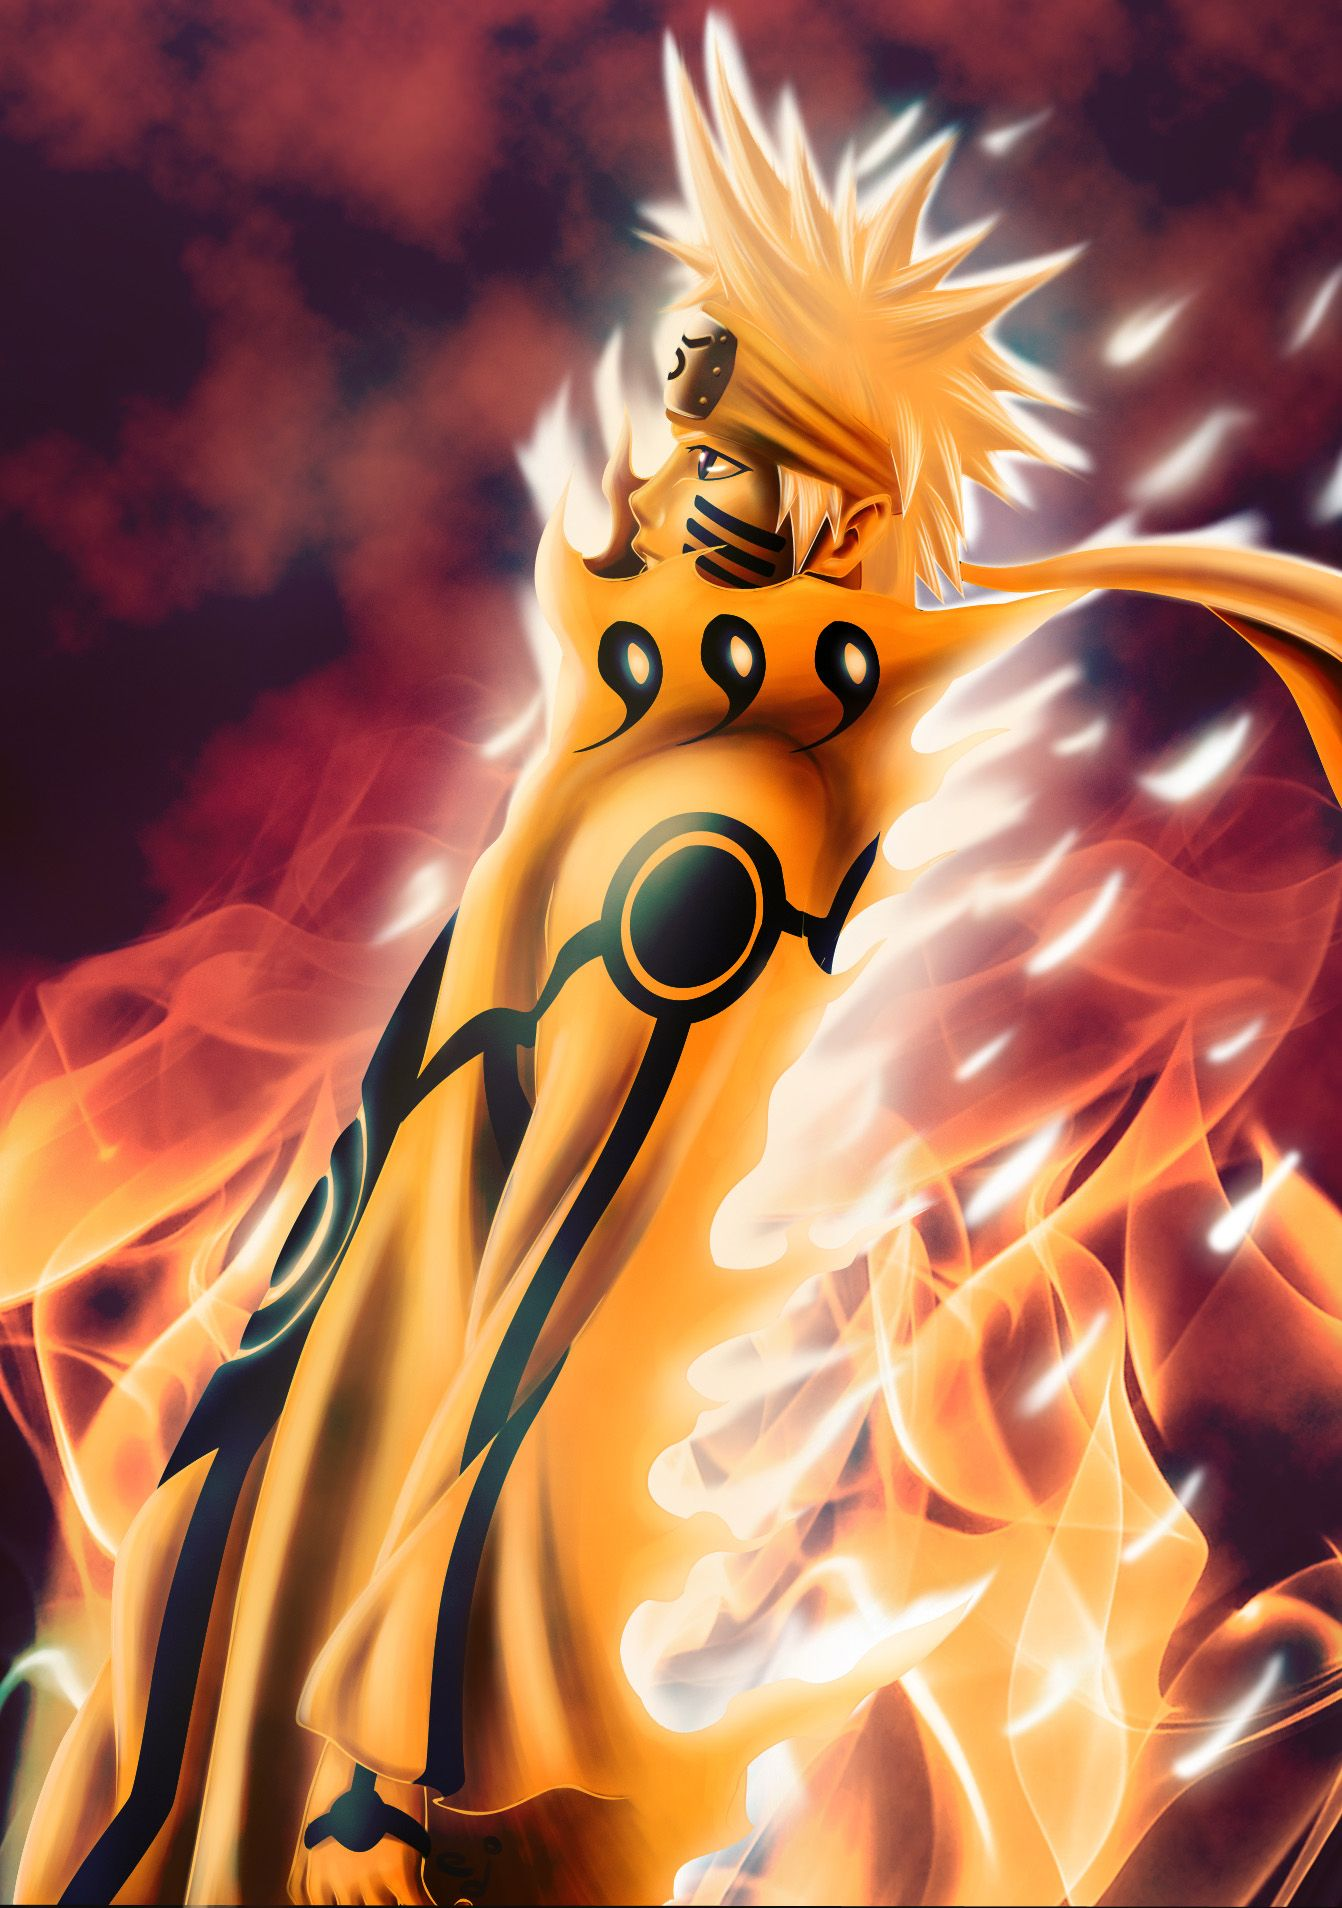 Naruto Bijuu Live Wallpaper for Android Naruto shipuden